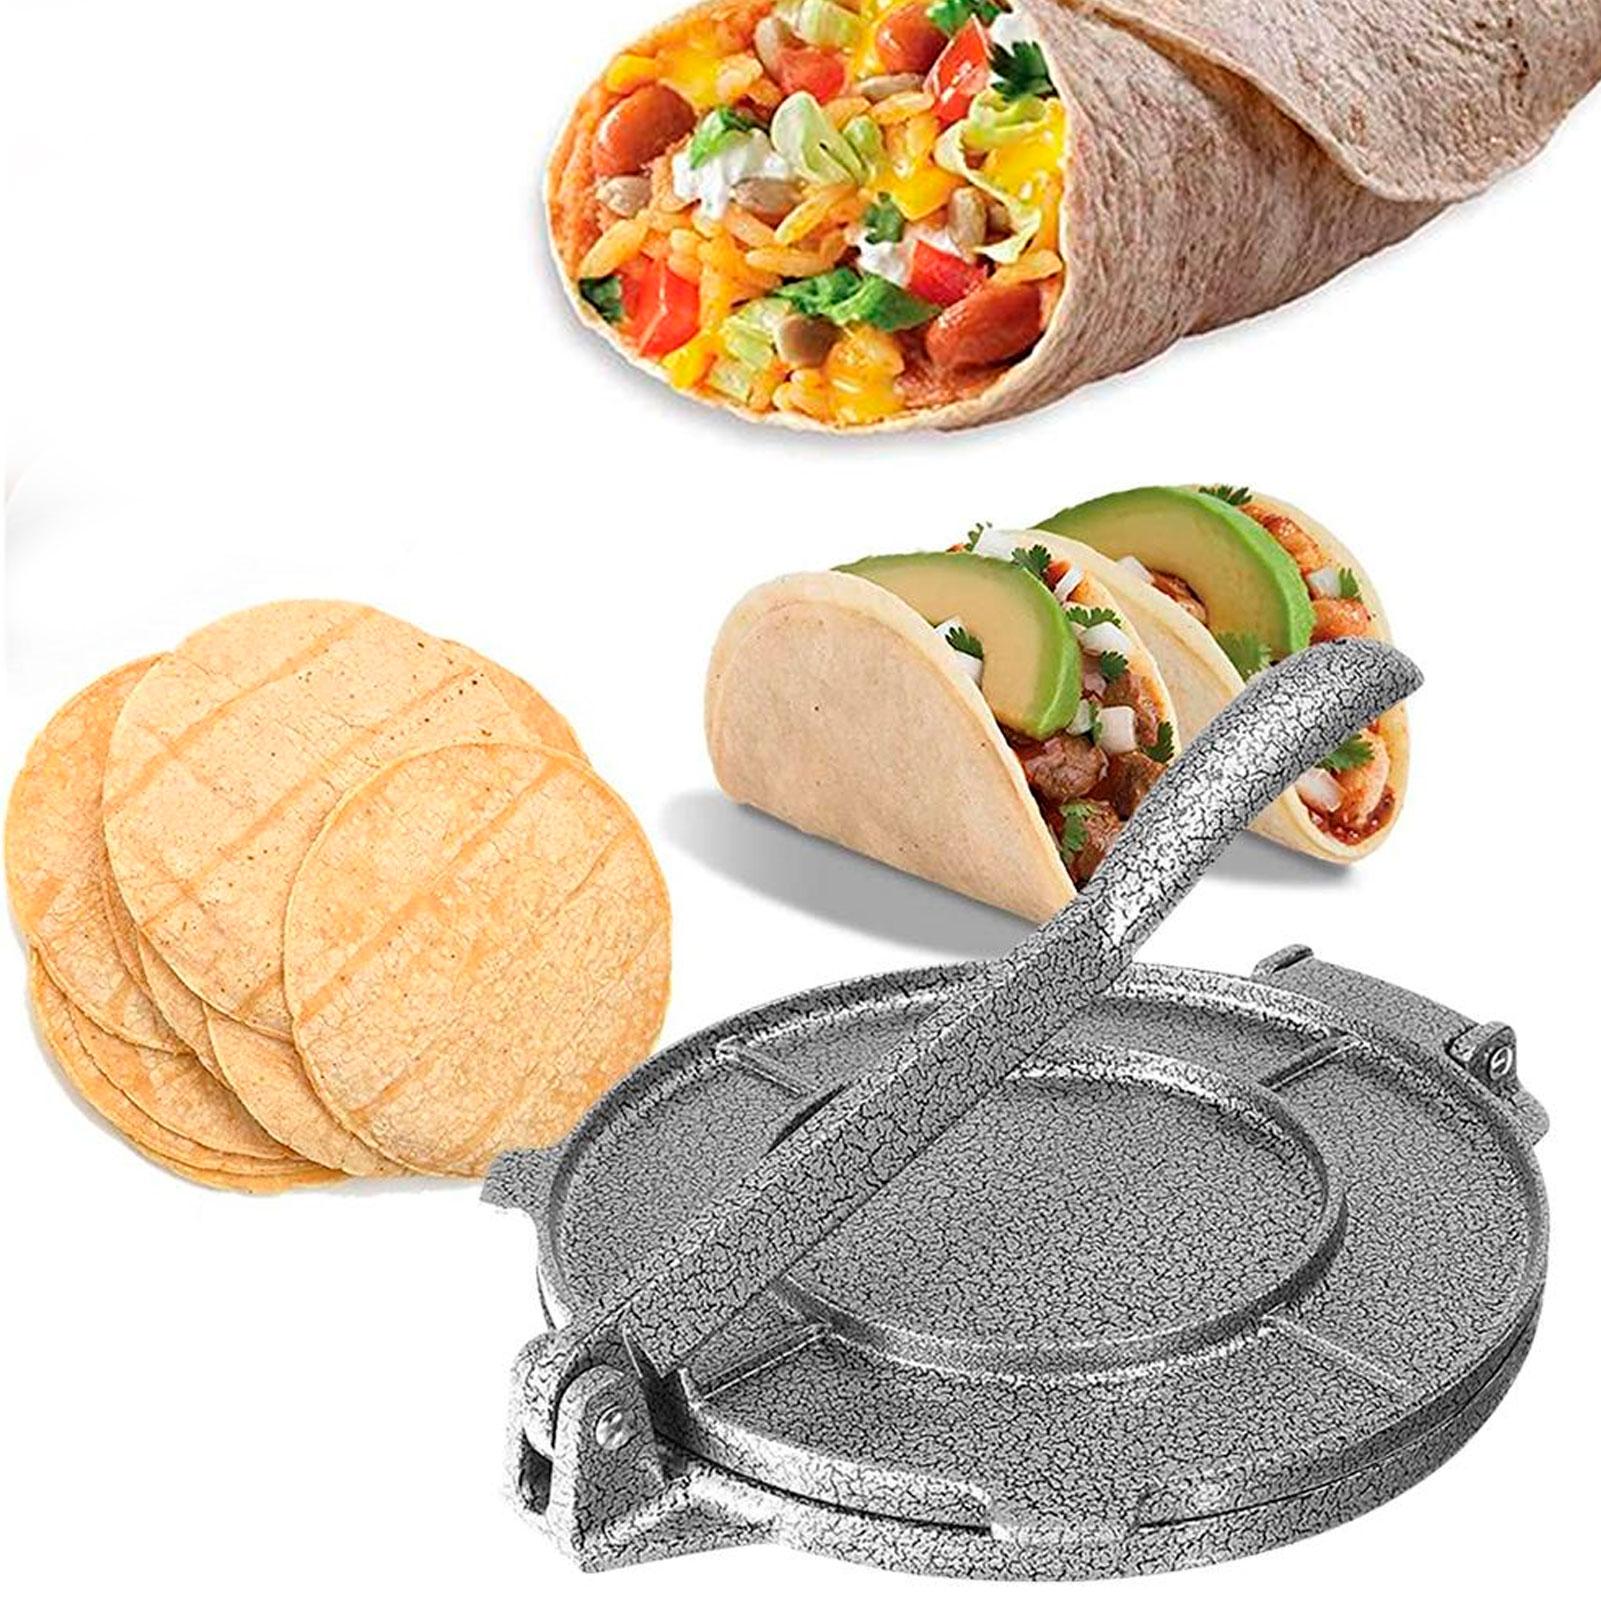 Máquina portátil de prensado de tortillas, utensilio de cocina para hornear, de...